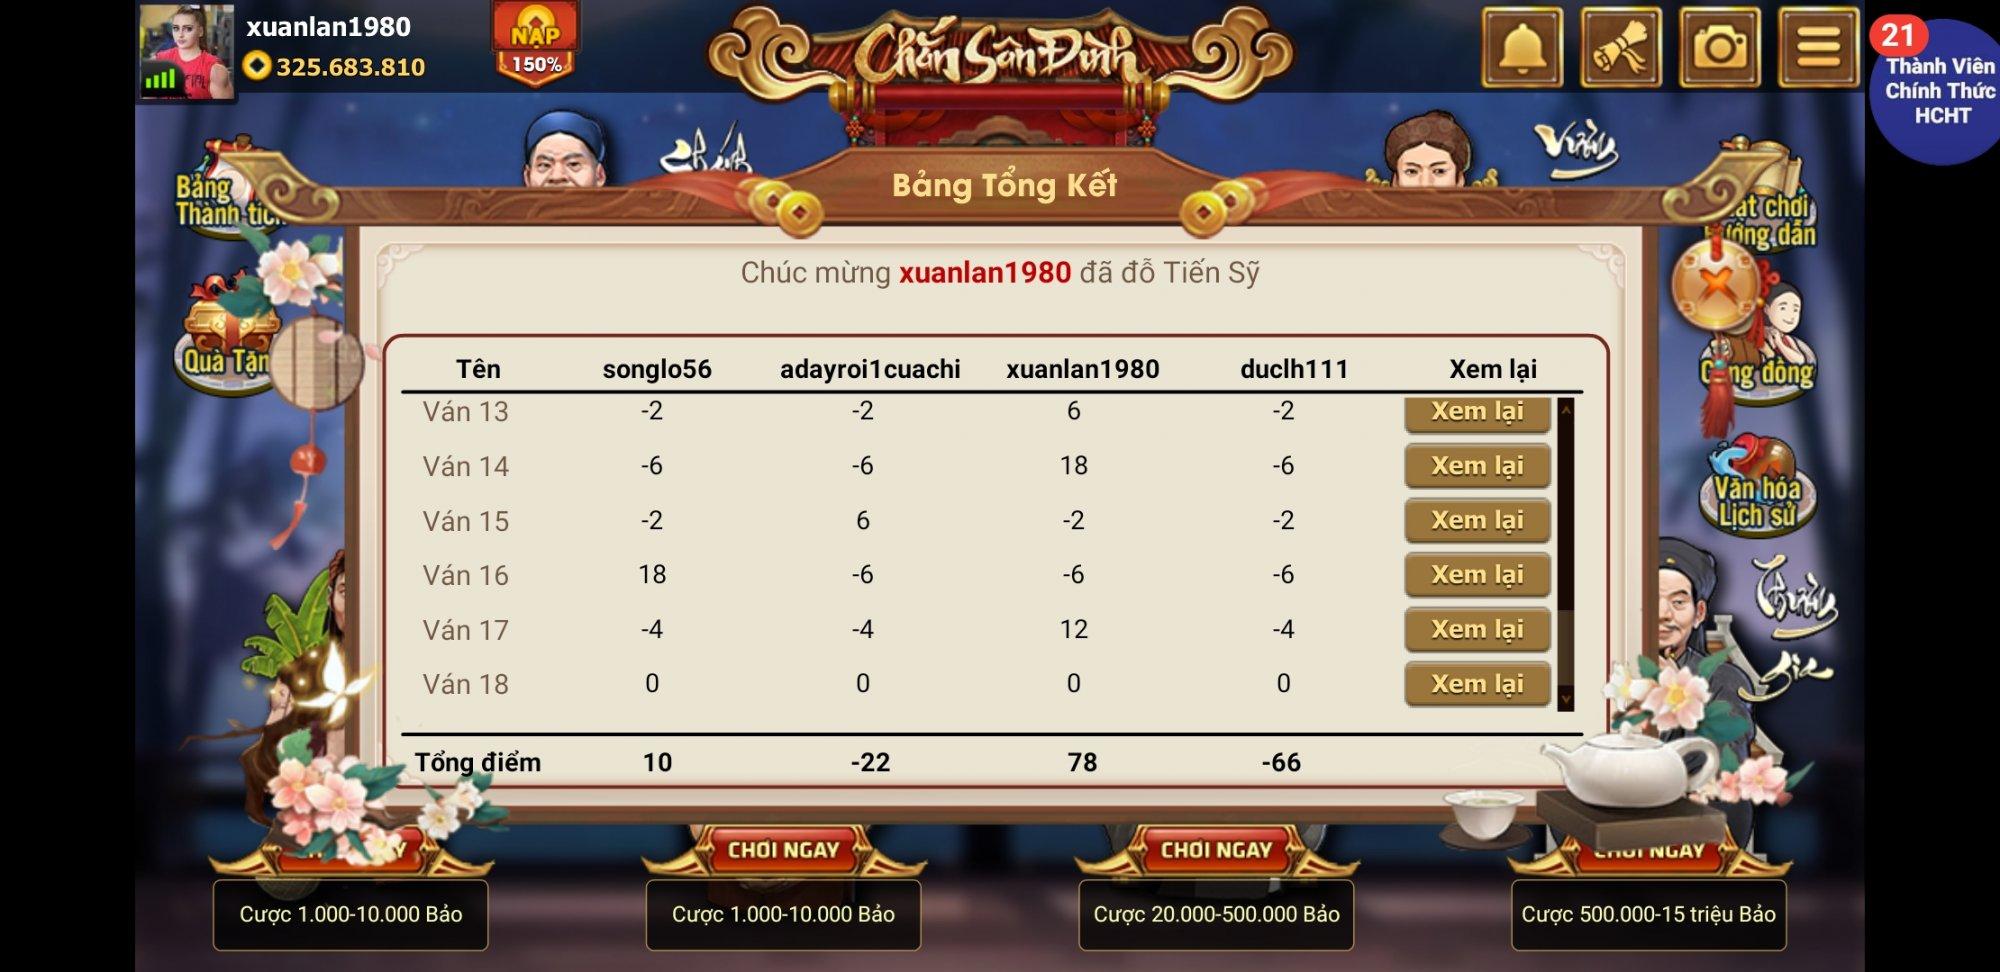 Screenshot_20200902-230359_Chn Sn nh.